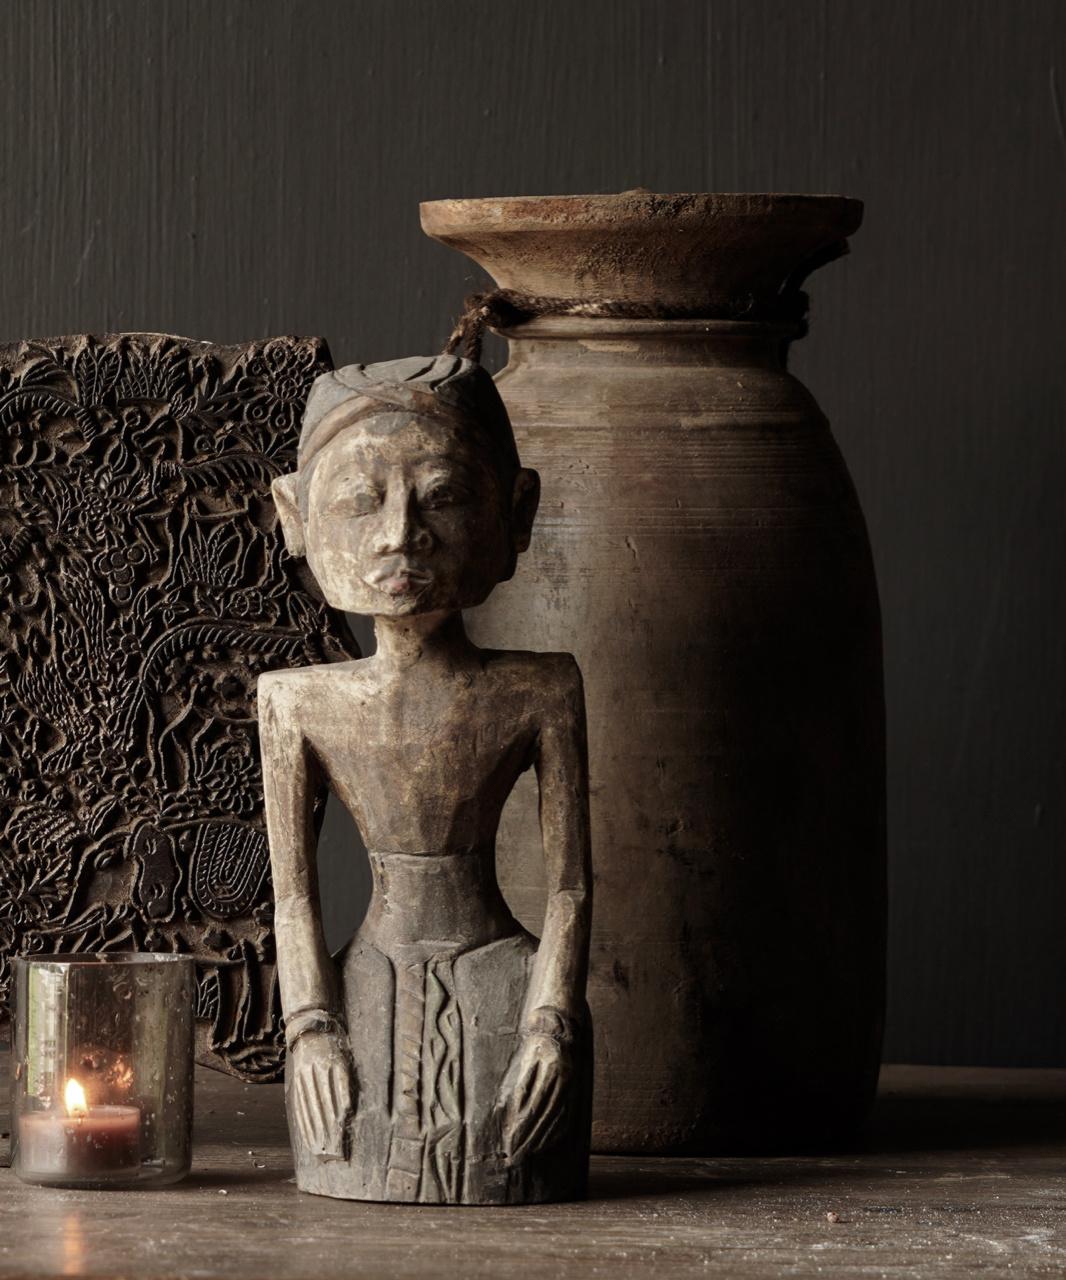 exclusive wooden Suar loro blonyo figurine-1